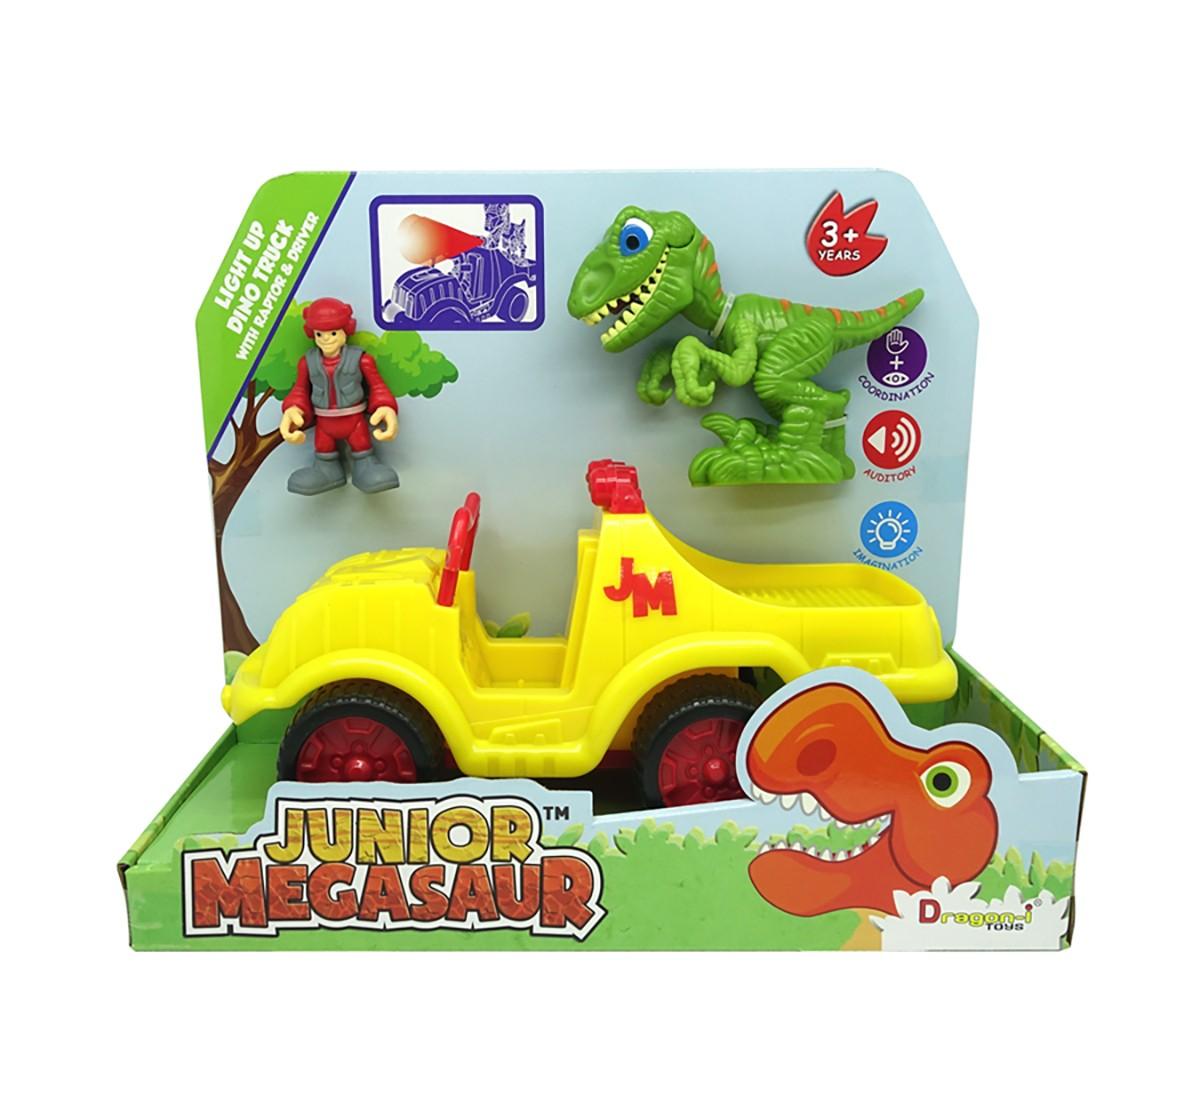 Dragon-I Junior Megasaur Dino Truck Activity Toy for Kids age 3Y+